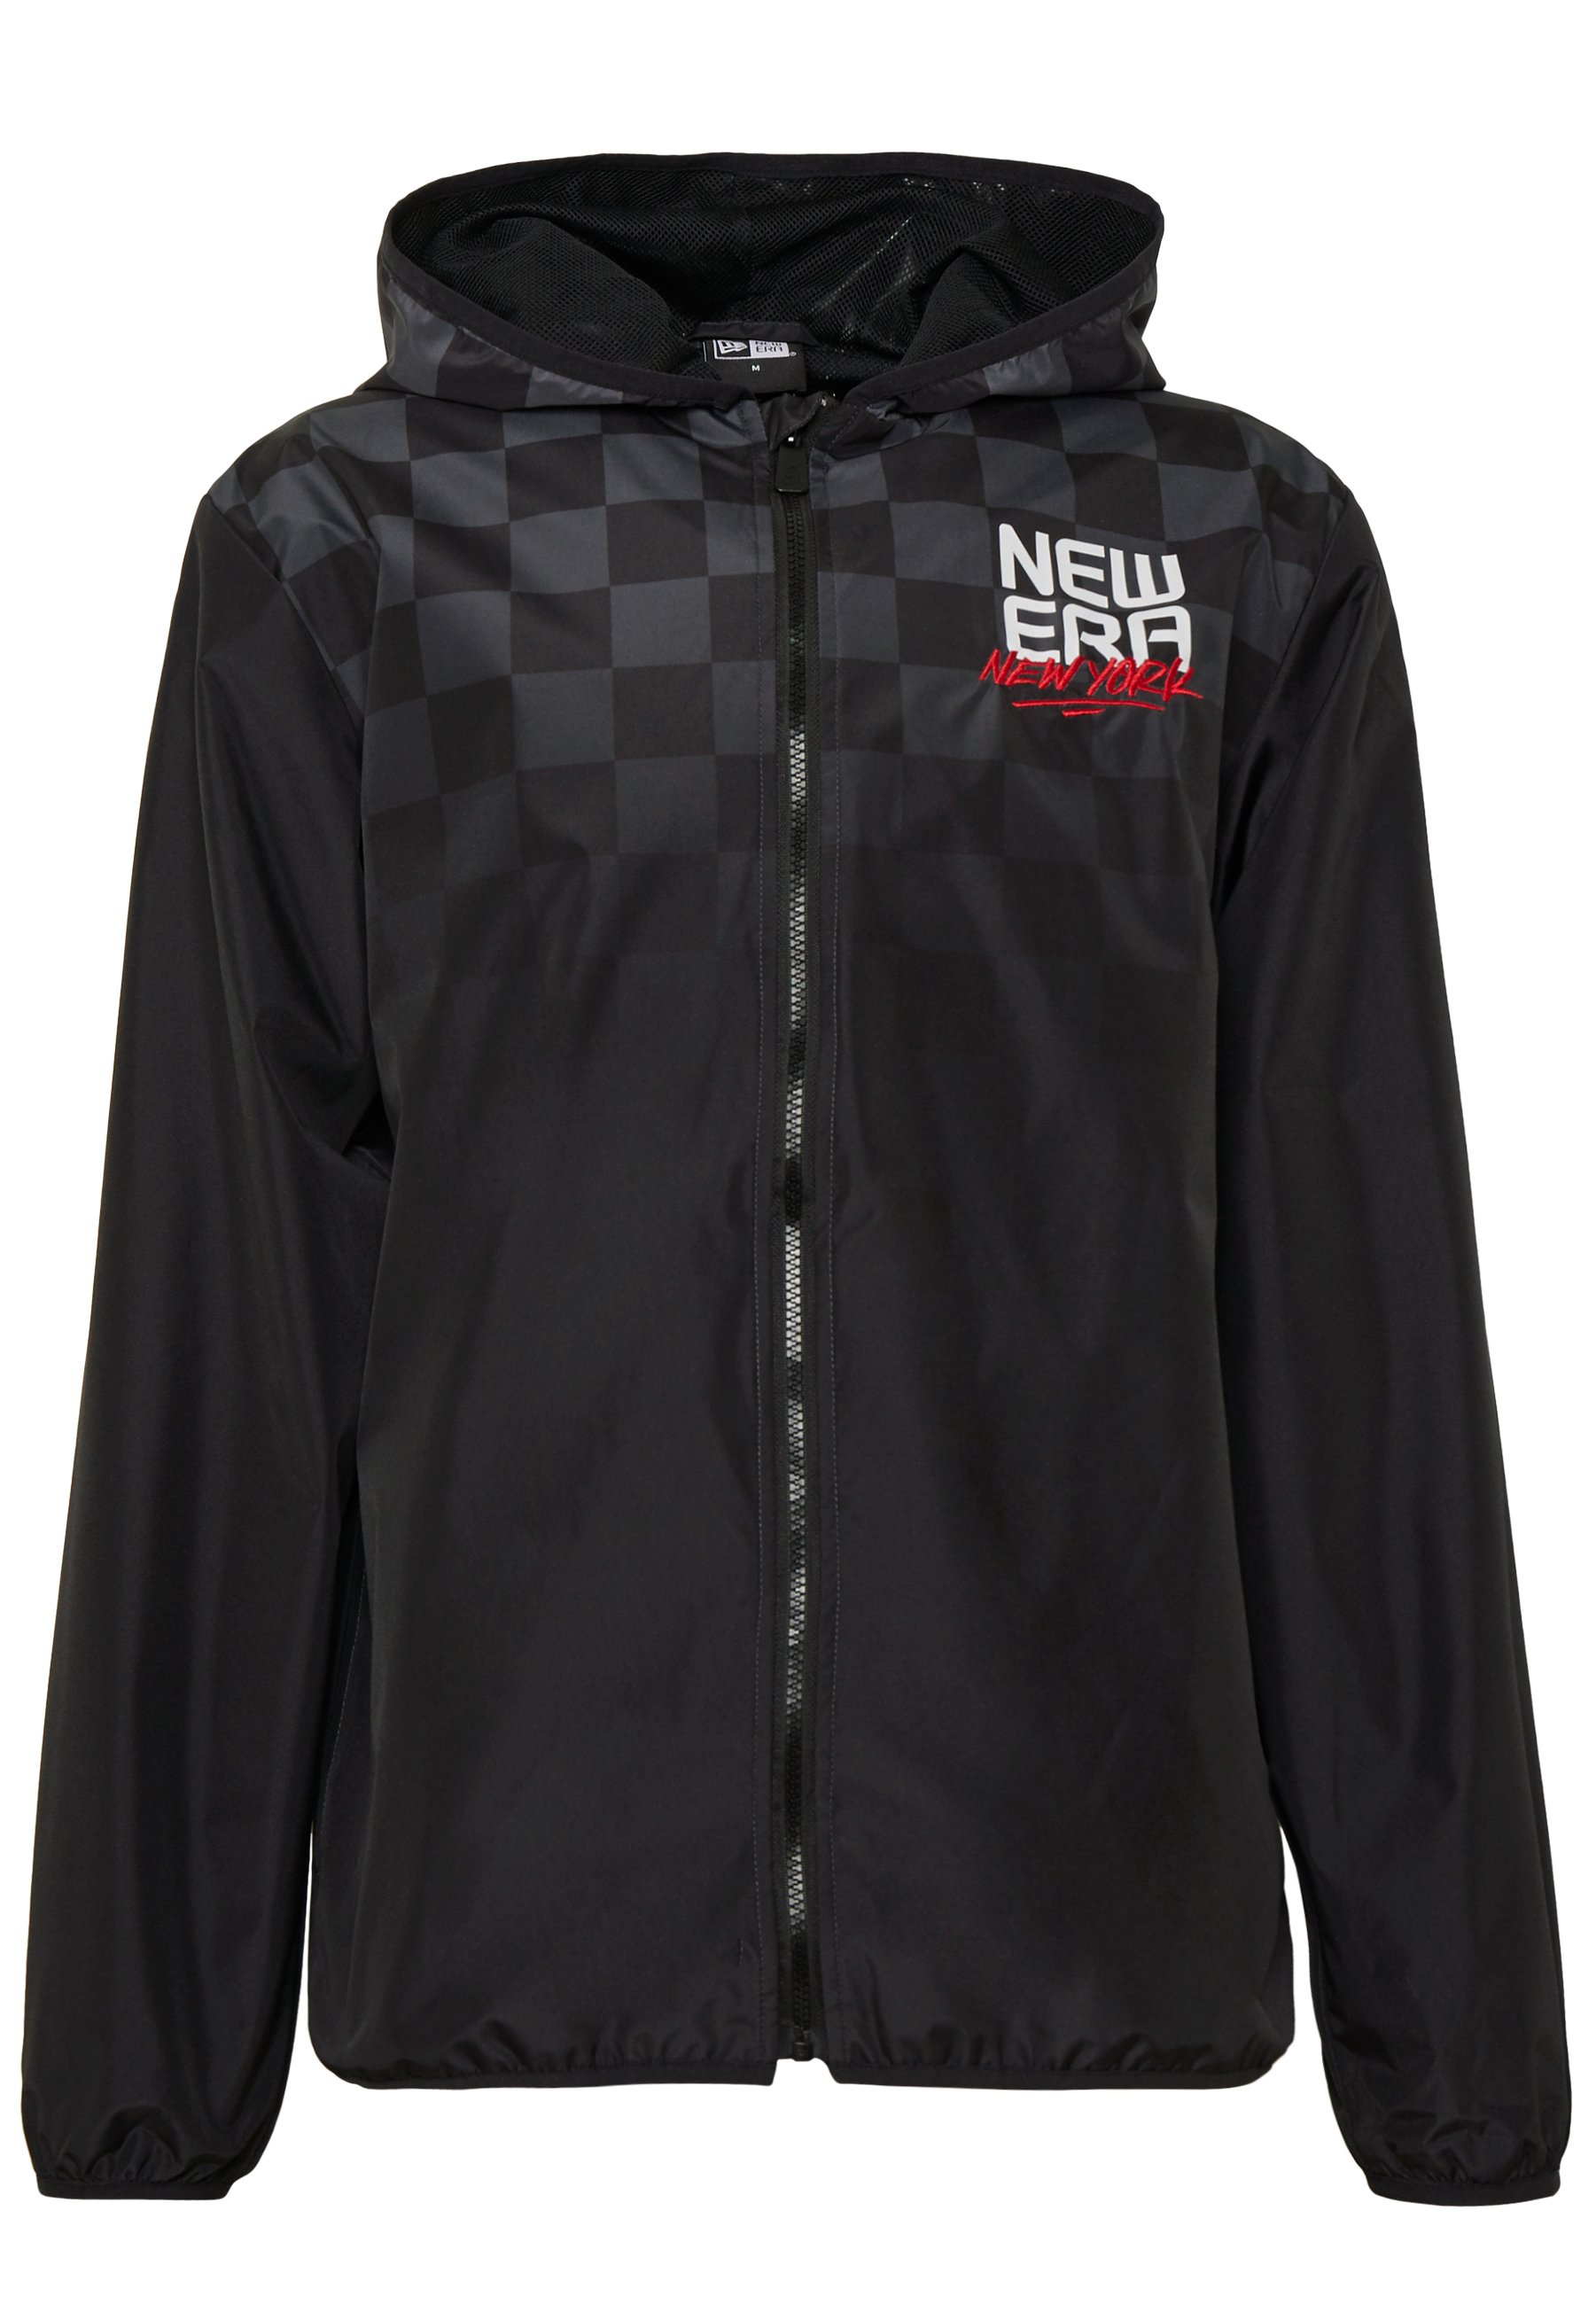 New Era Contemporary - Giacca A Vento Black ePl8T